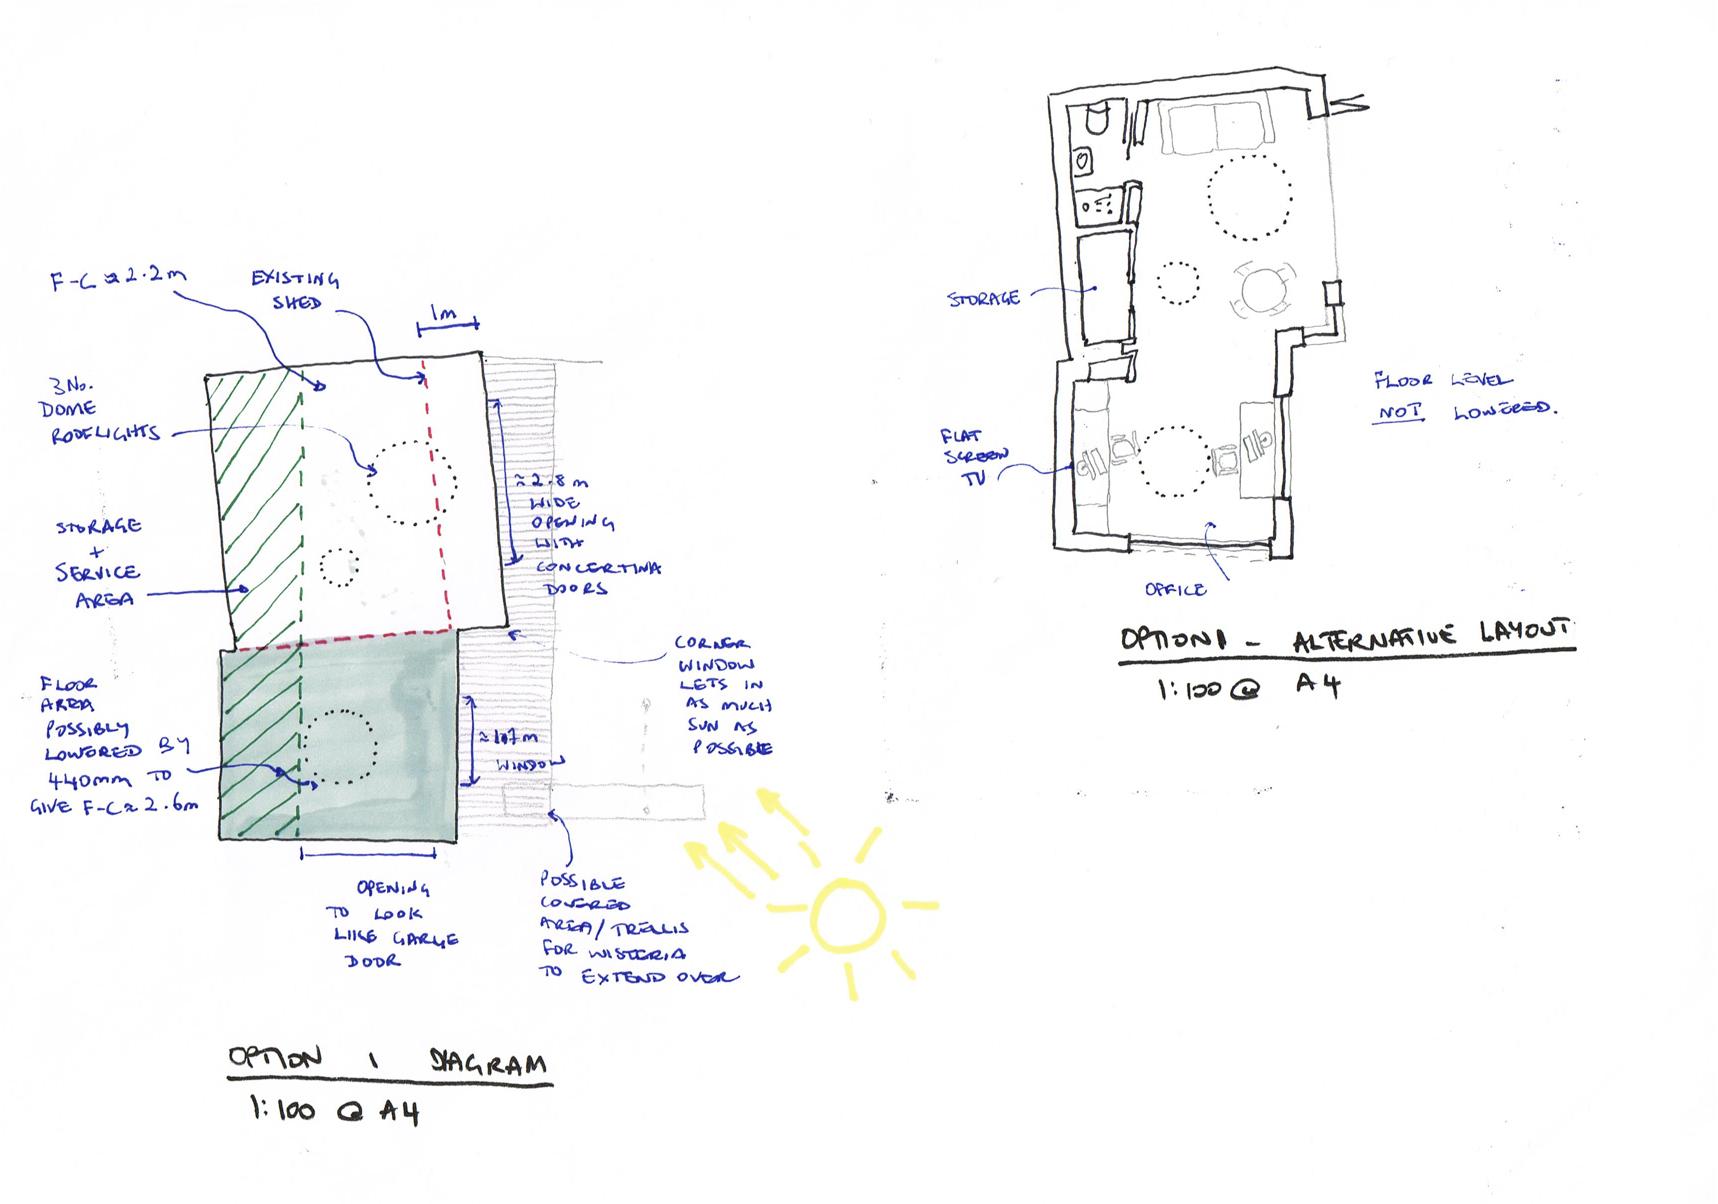 139 Diagram plans.jpg